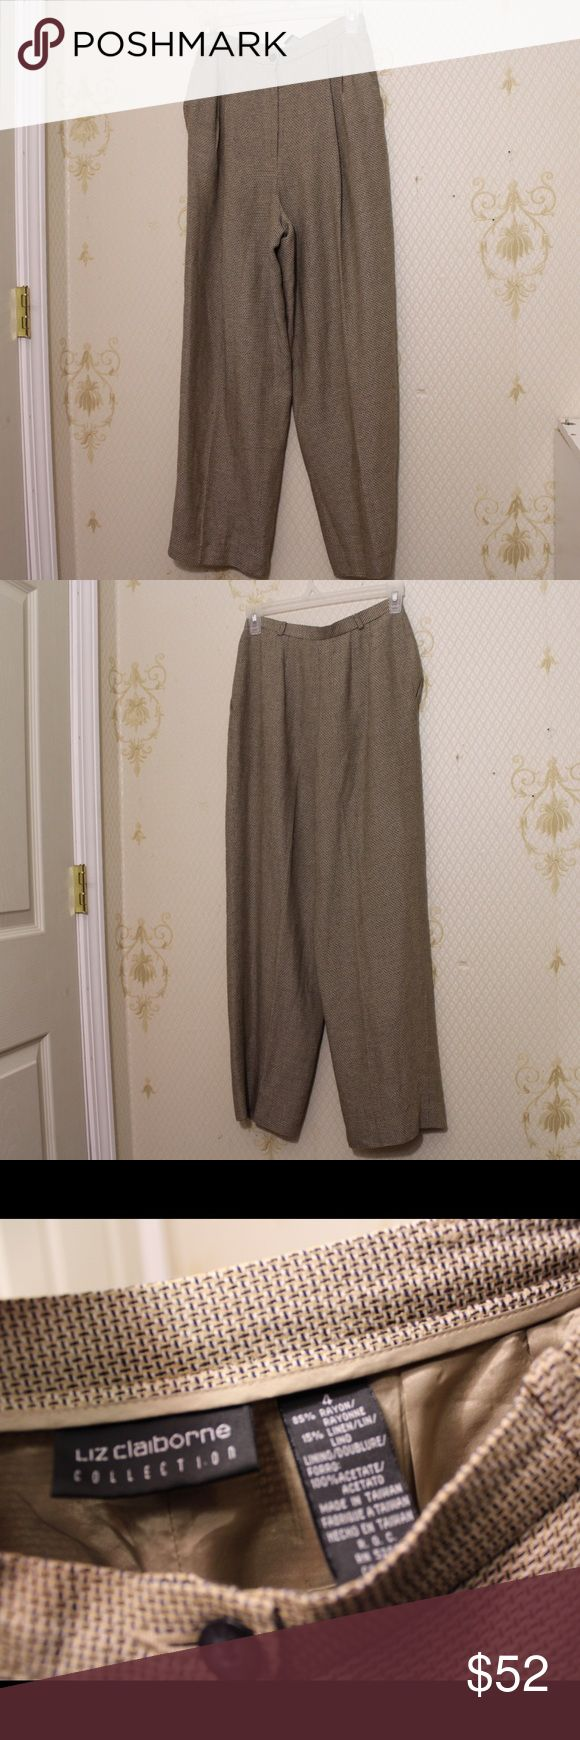 Liz Claiborne Size 4 Bottoms Liz Claiborne Size 4 Bottoms. No known defects. Liz Claiborne Pants